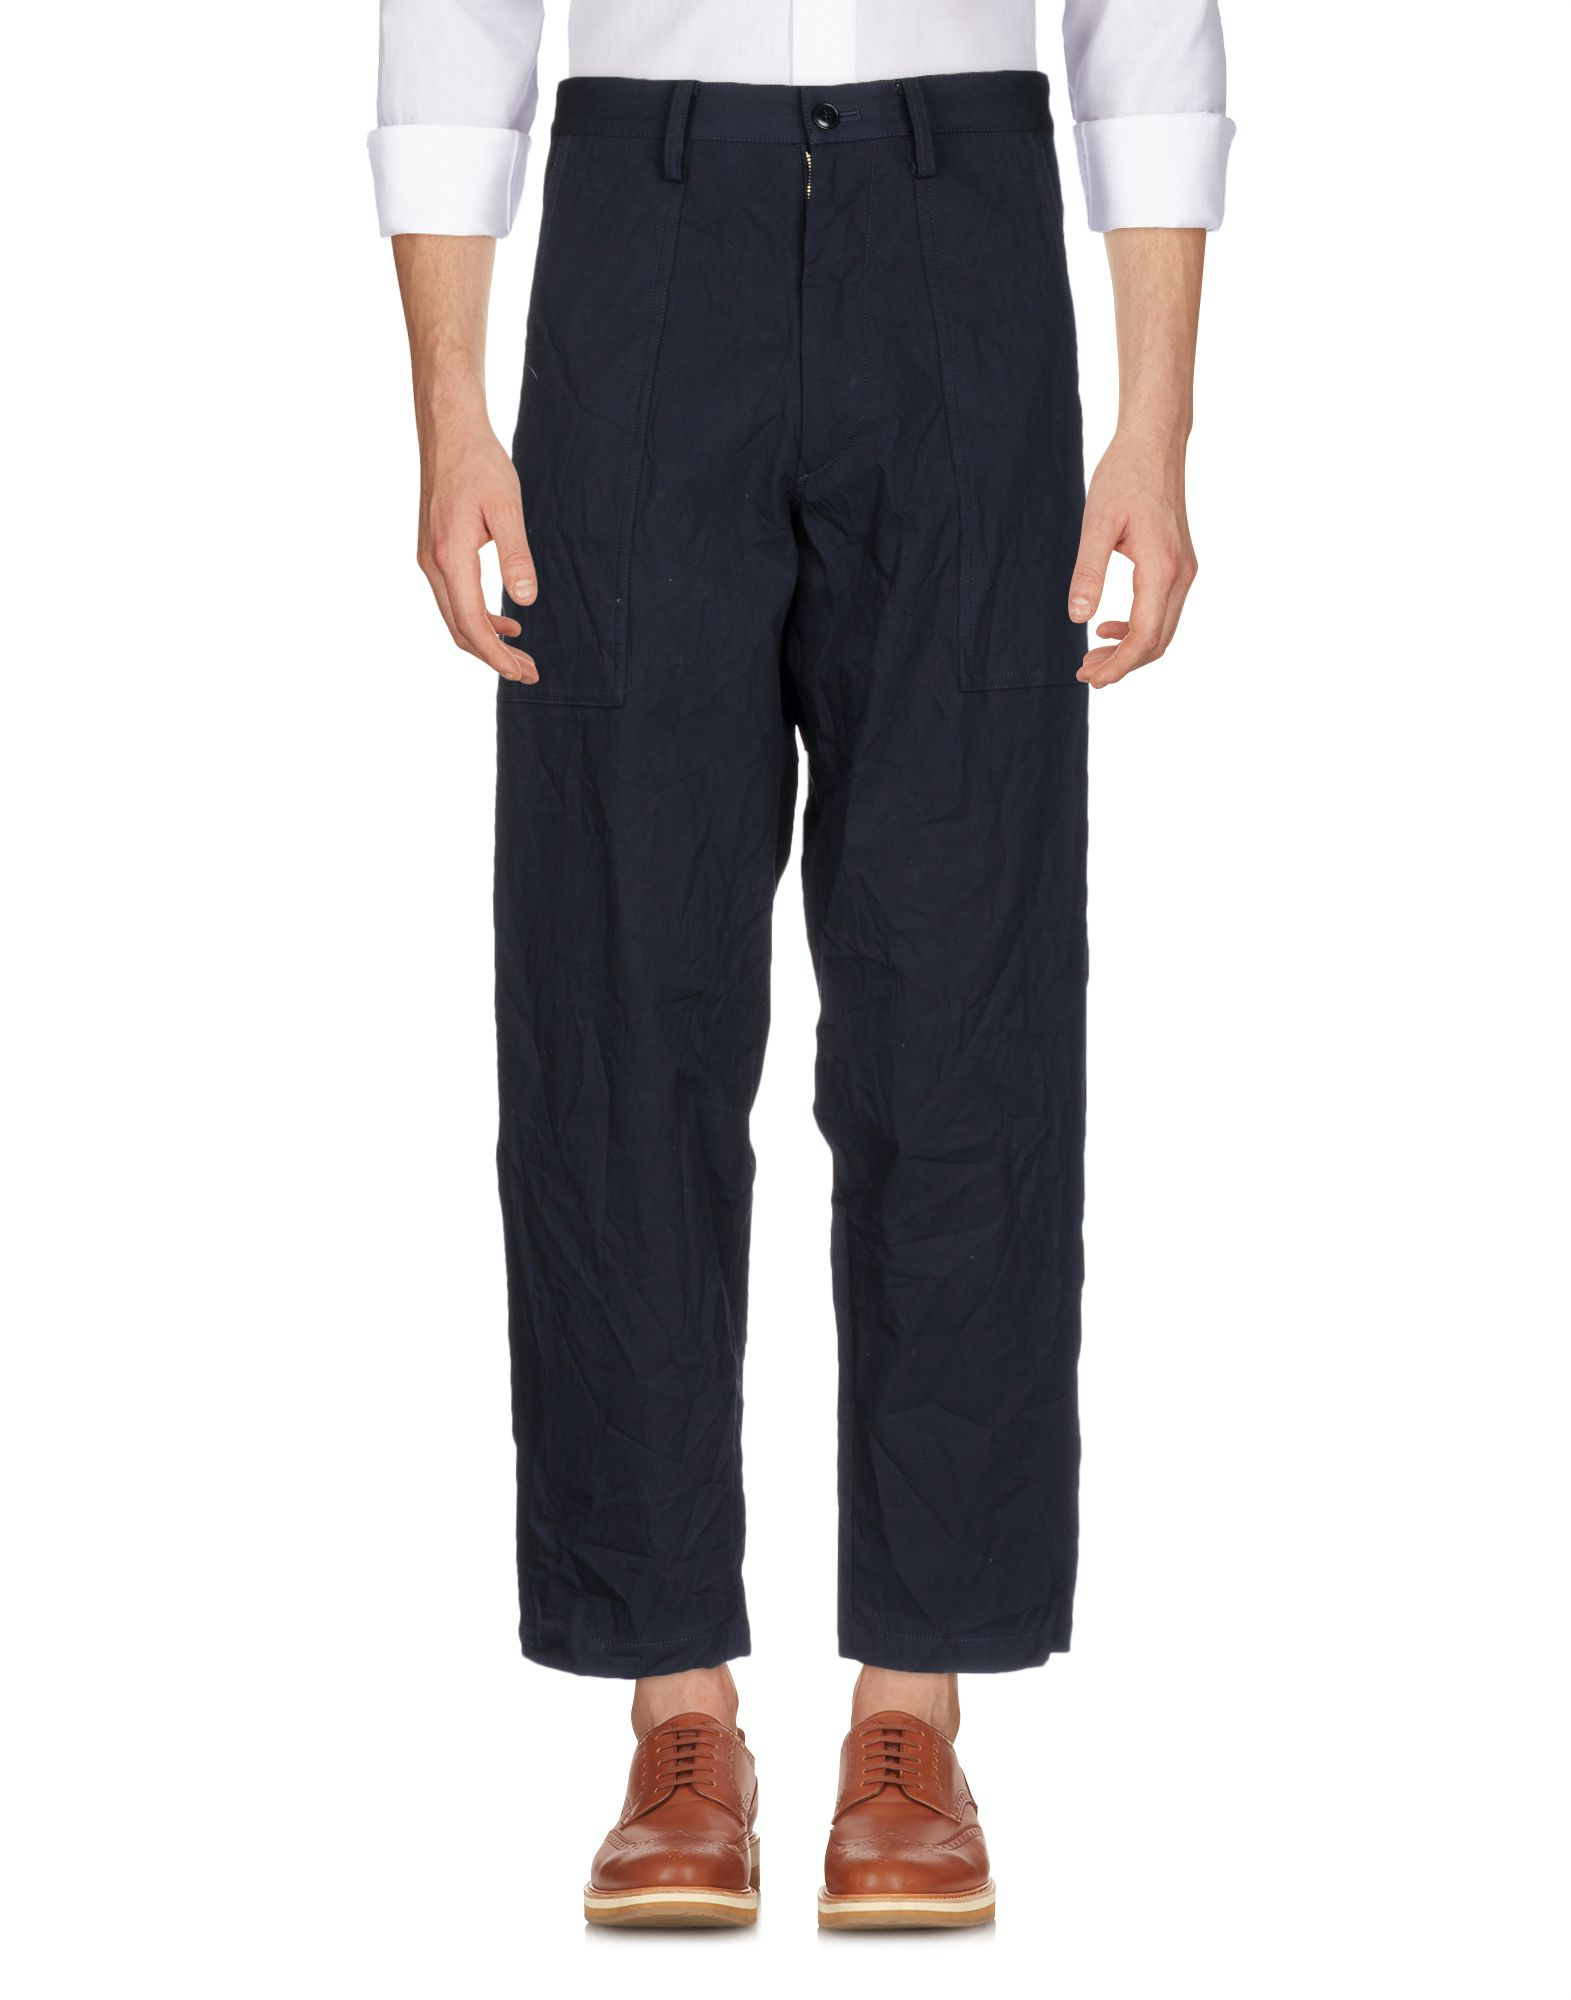 Pantalone Ys Yohji Yamamoto Uomo - Acquista online su